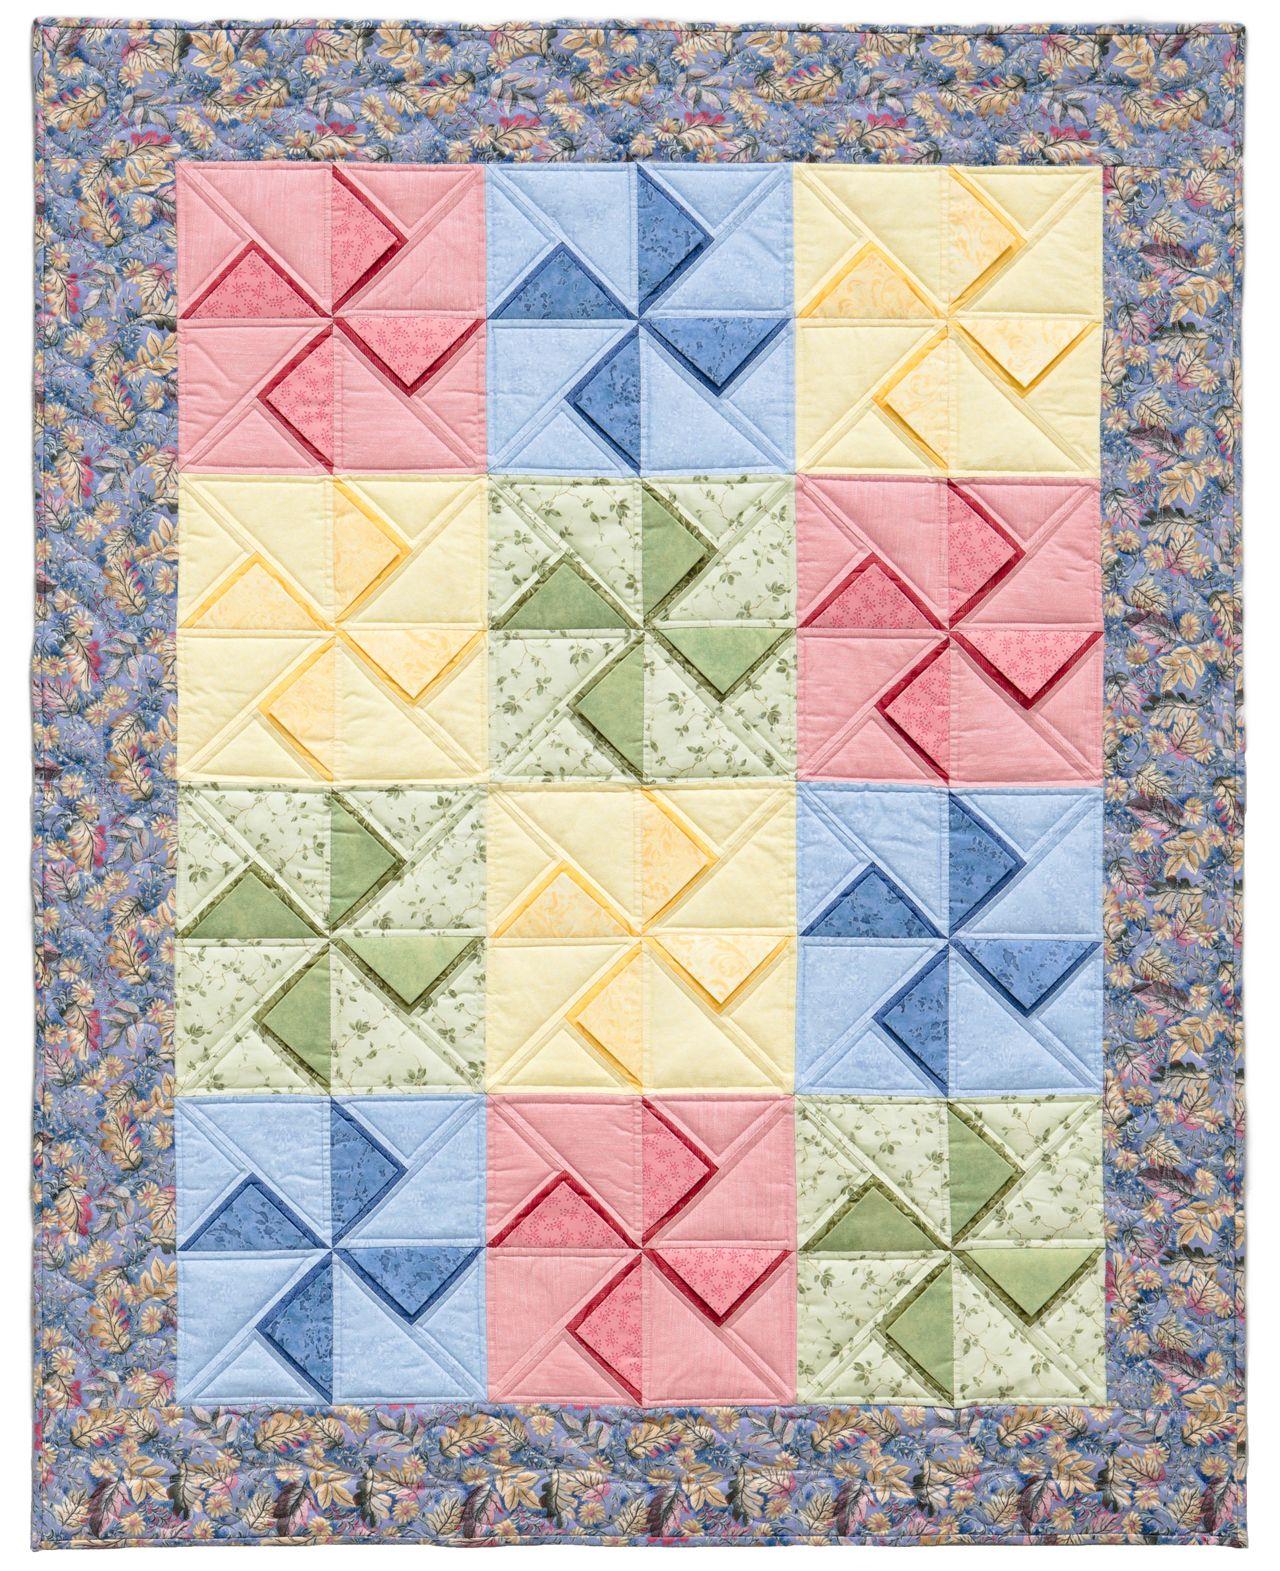 Prairie Point Pizzazz Quilt Gallery | Quilt Designs I Like ... : quilt photos galleries - Adamdwight.com